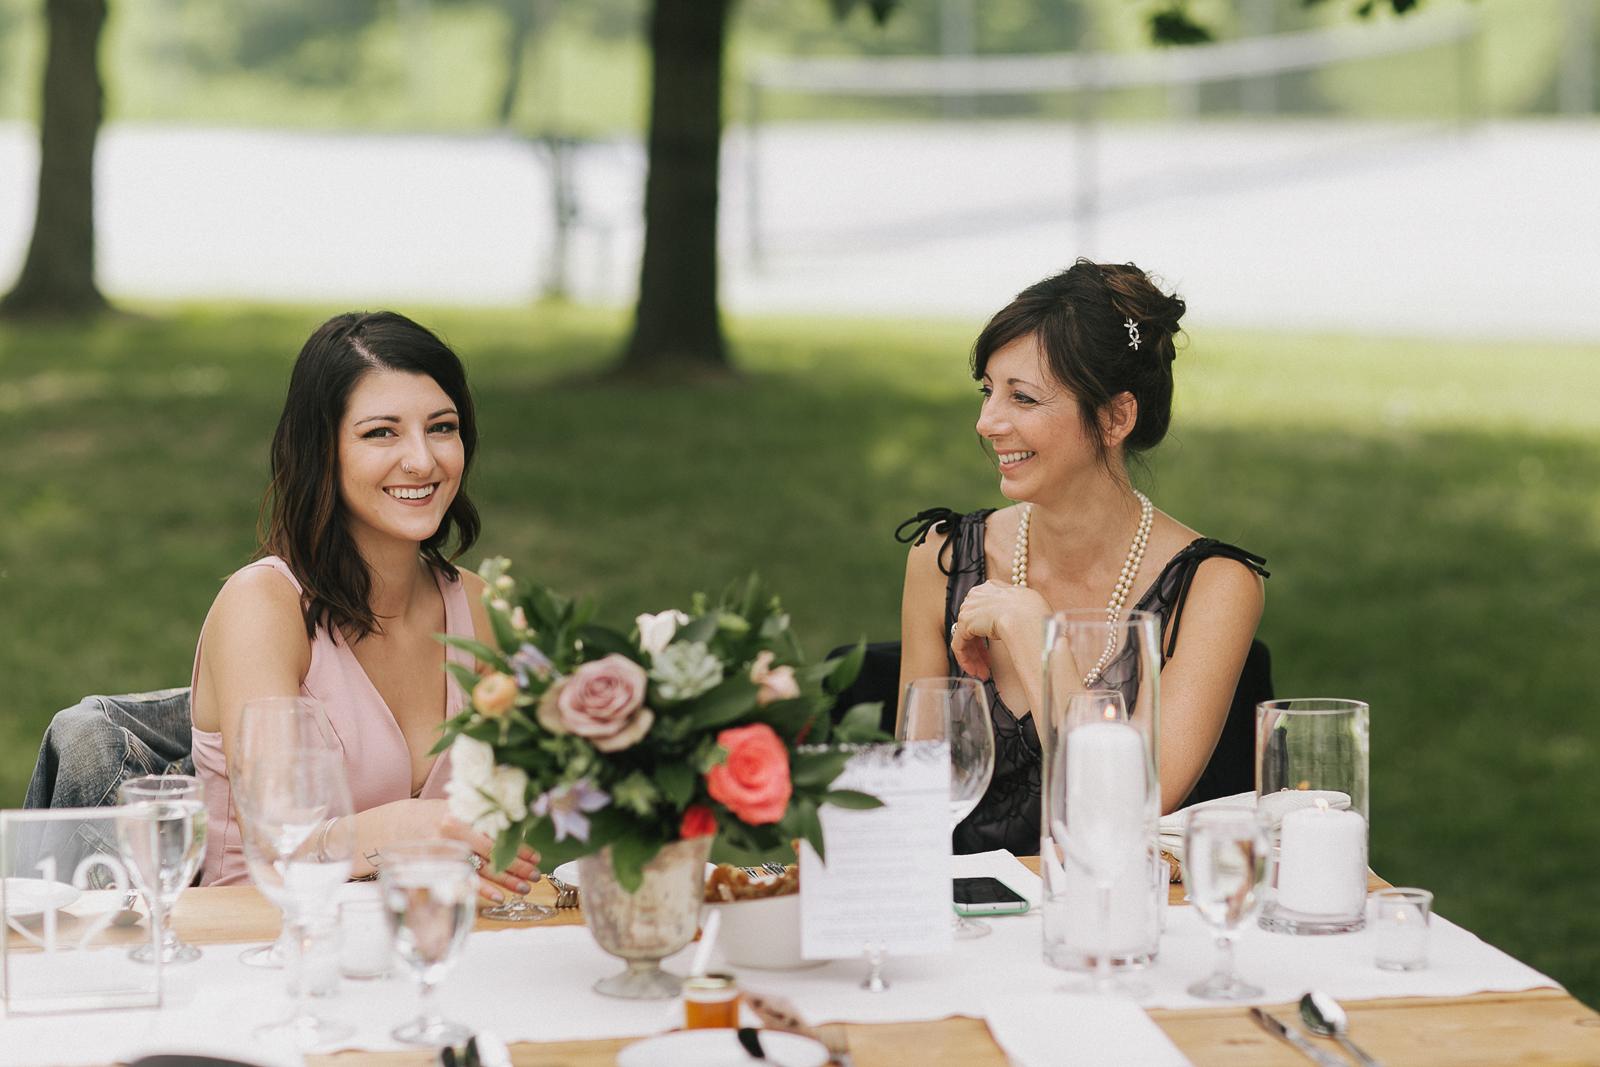 mike-and-jenni-wedding-367.jpg